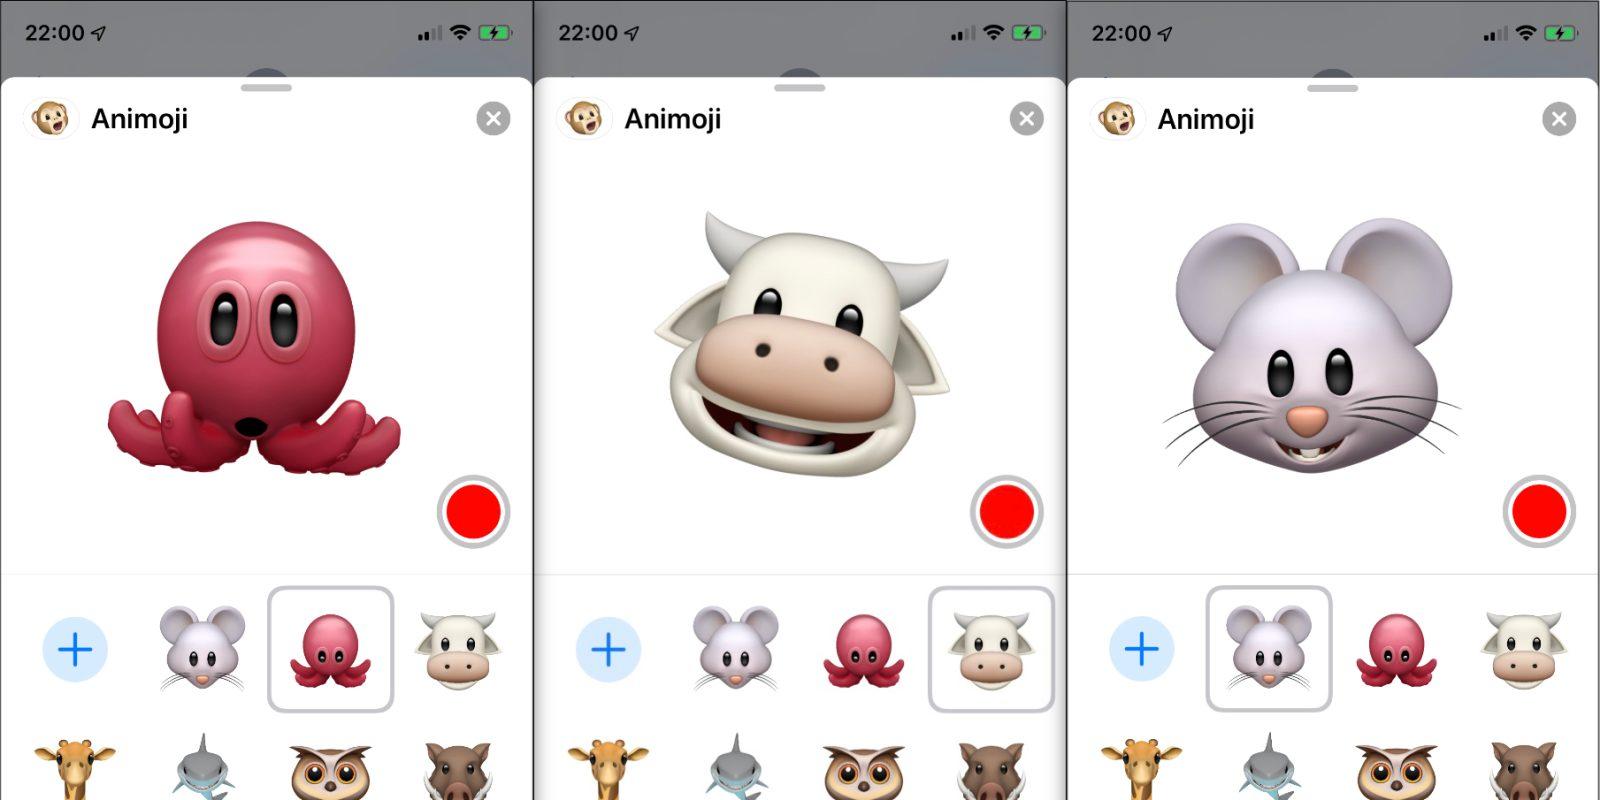 iOS 13 features three new Animoji and Memoji Stickers - 9to5Mac